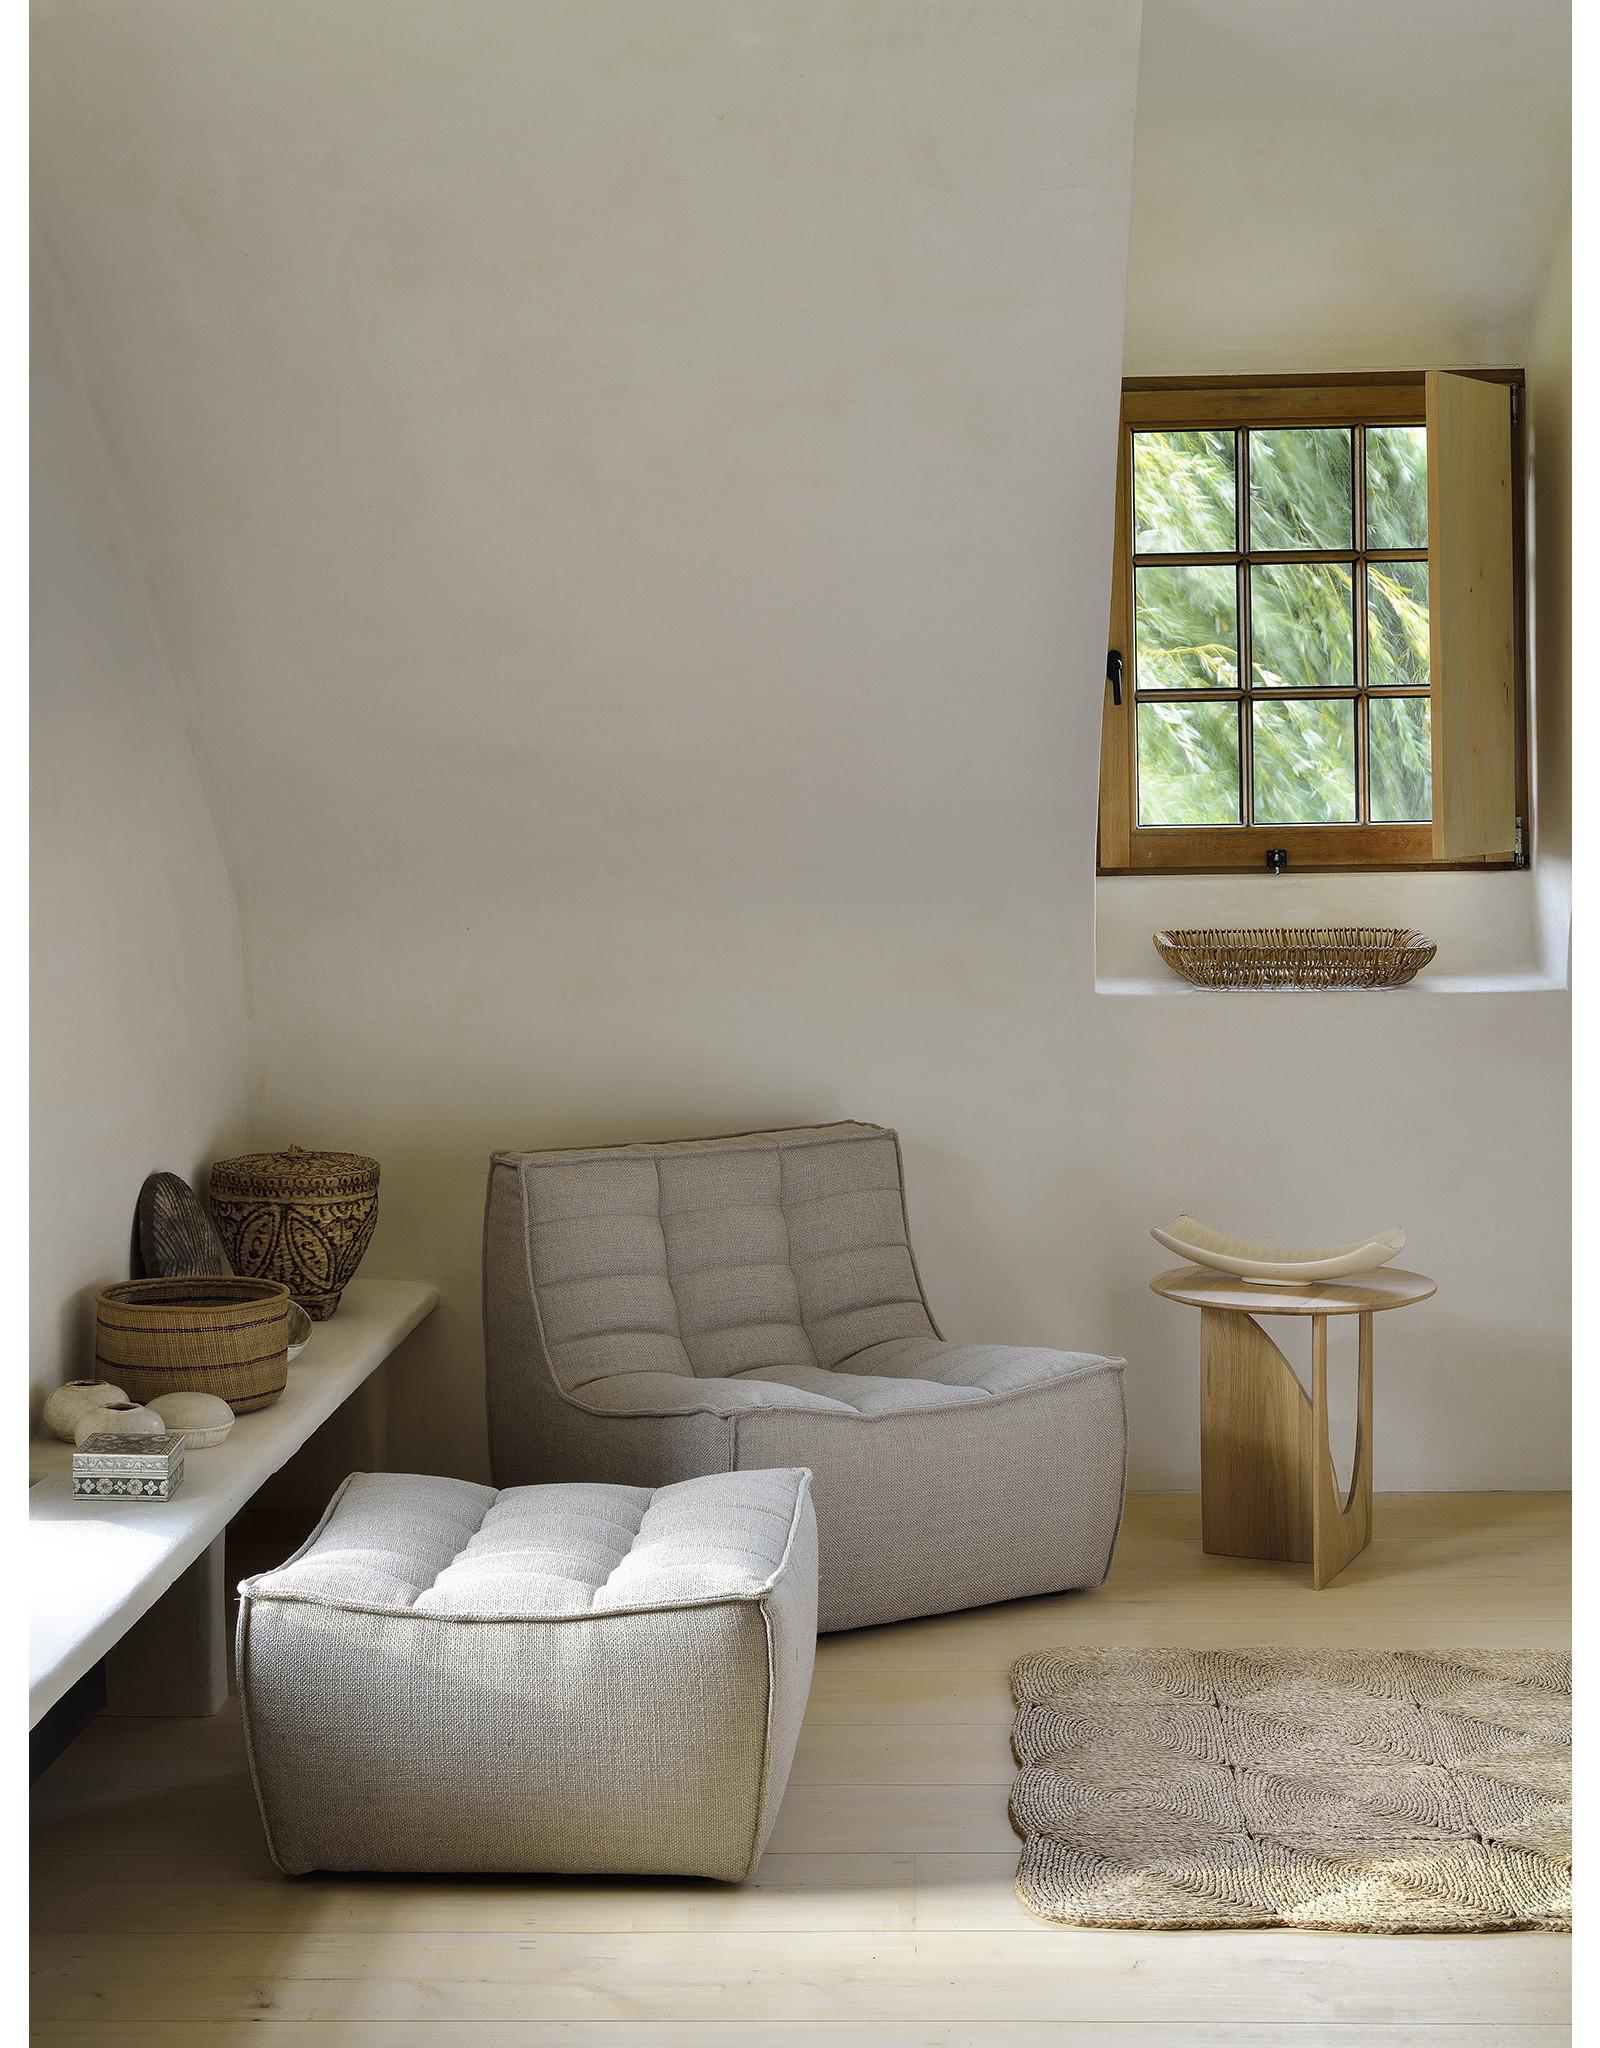 Ethnicraft N701 One Seater - Beige